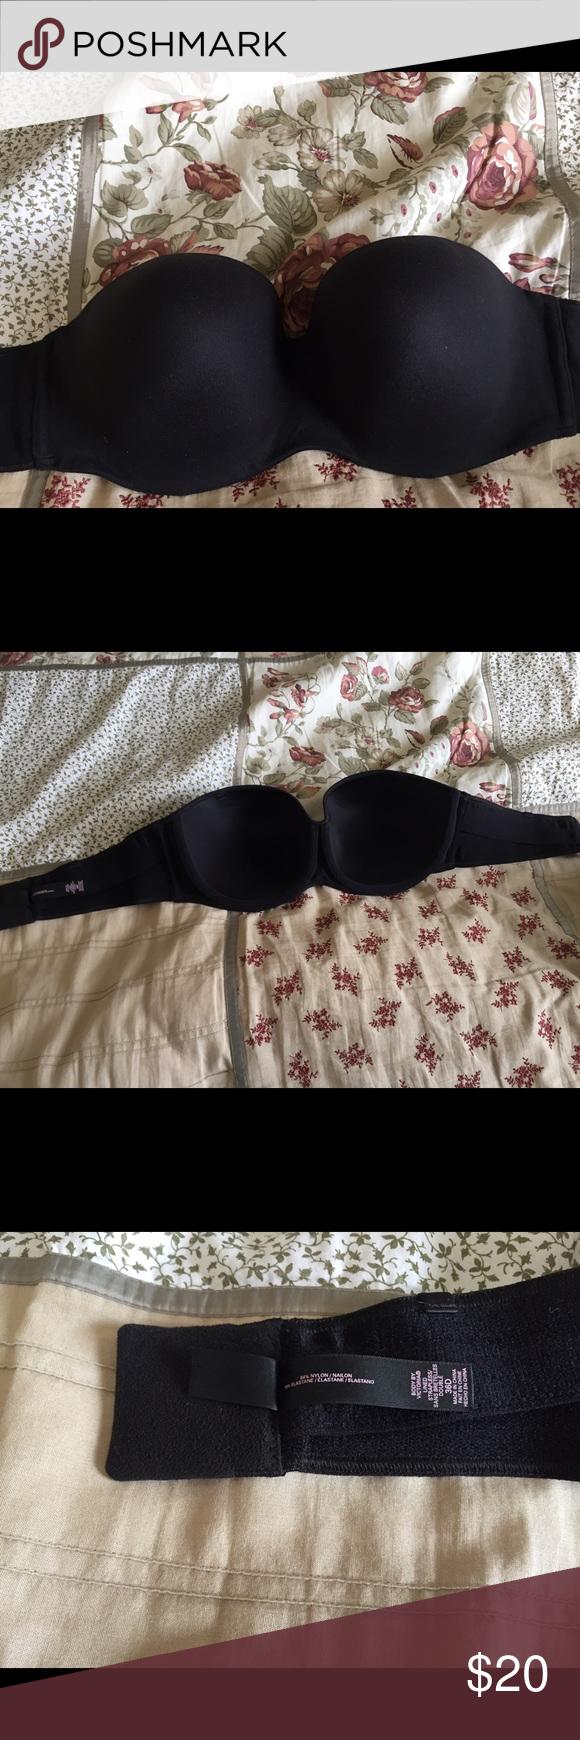 Body by Victoria secret strapless bra. 36d. Black strapless bra. It is hardly used. 36d Victoria's Secret Intimates & Sleepwear Bras